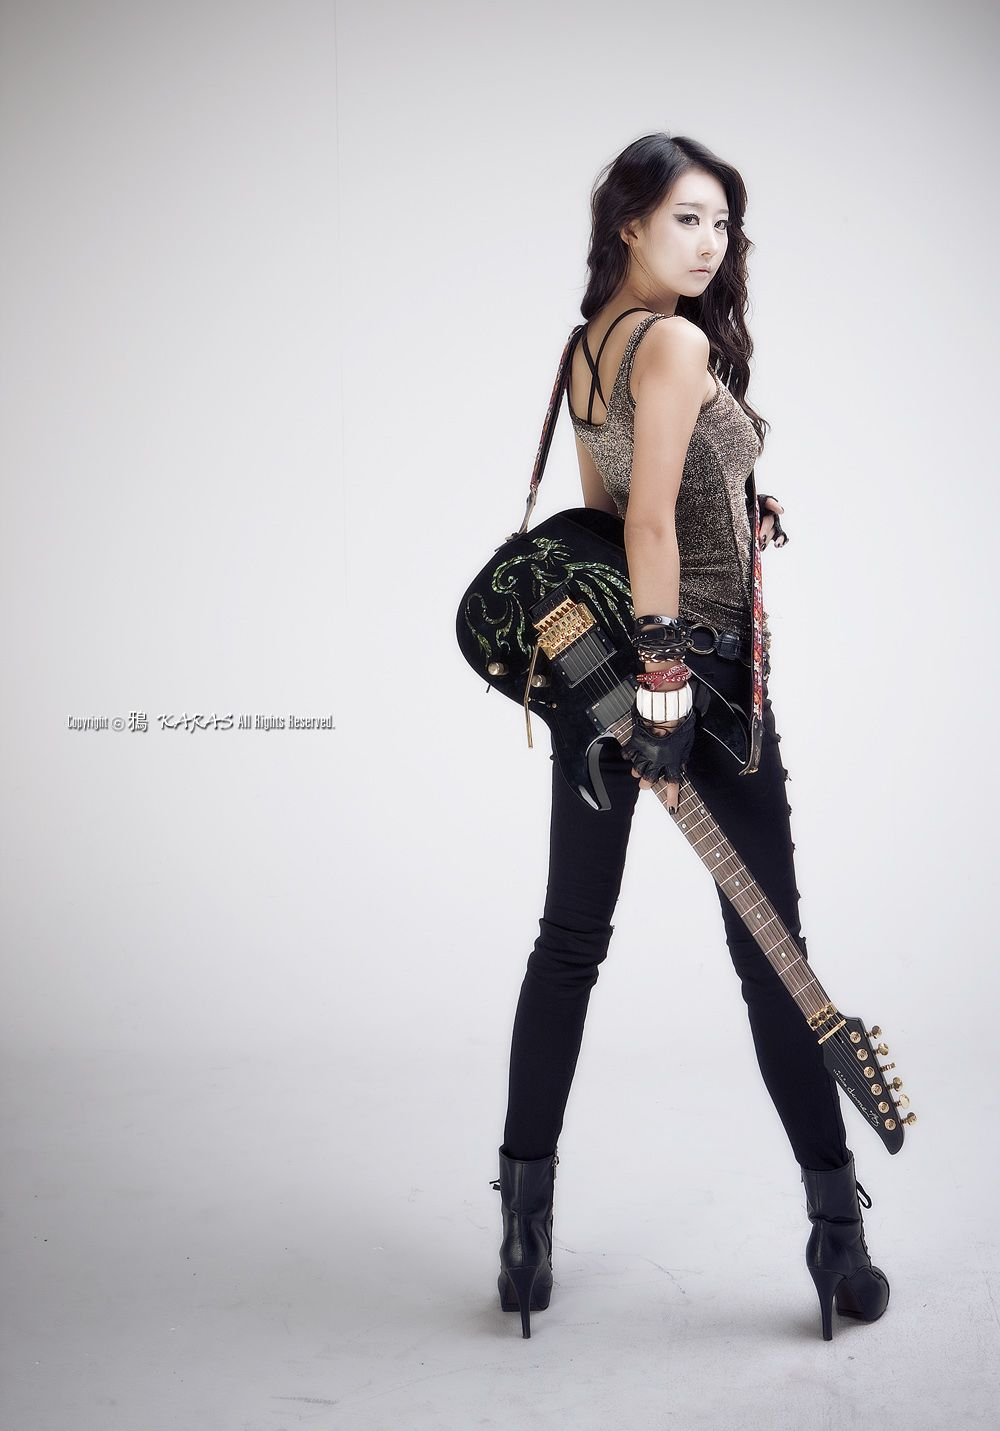 Rock girl pics 10